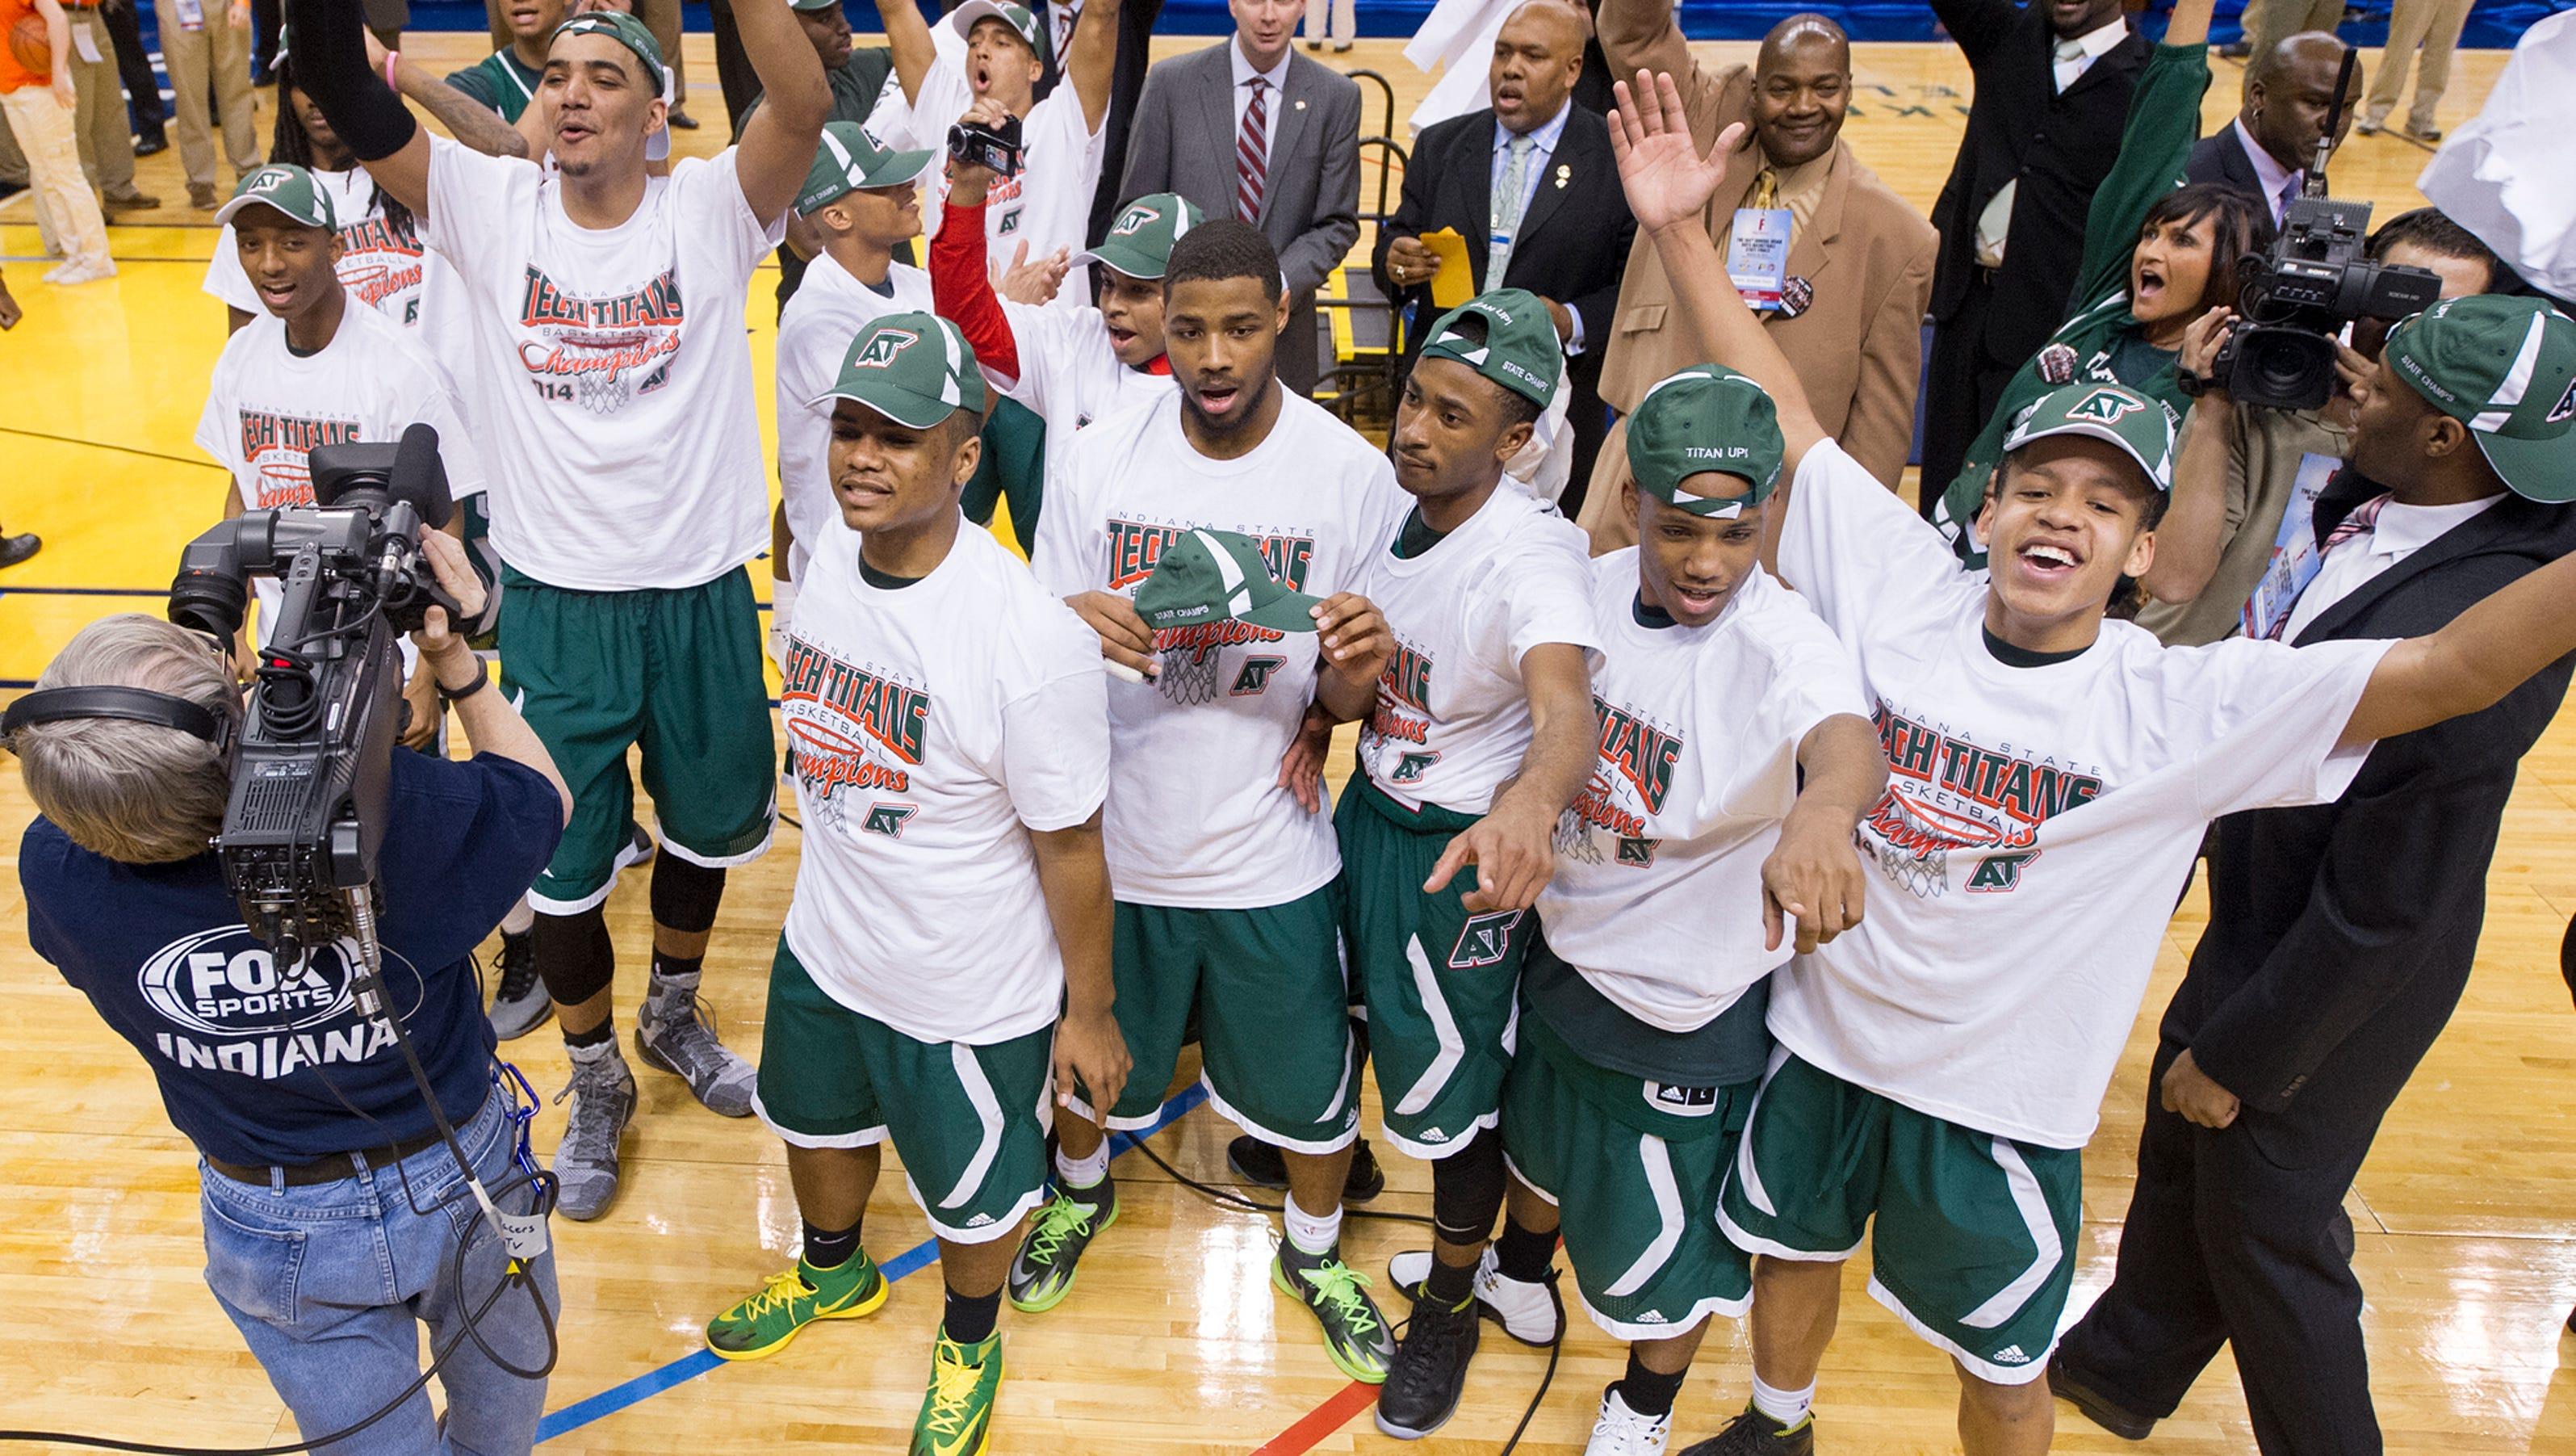 Ihsaa Boys Basketball Tournament Pairings Indystar | All Basketball Scores Info